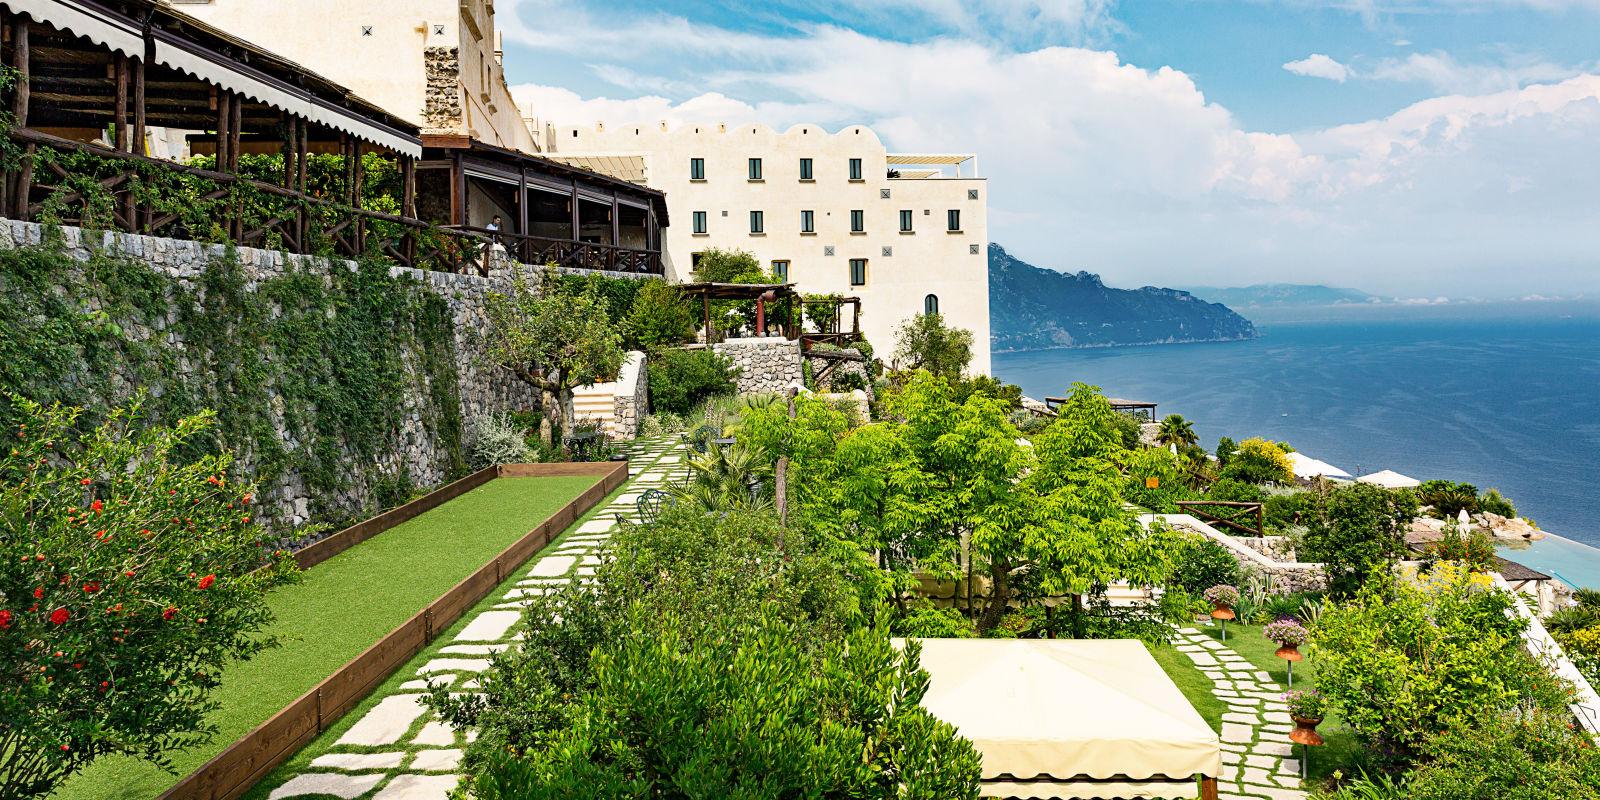 The monastero santa rosa is the amalfi coast 39 s newest five for Hotel luxury amalfi